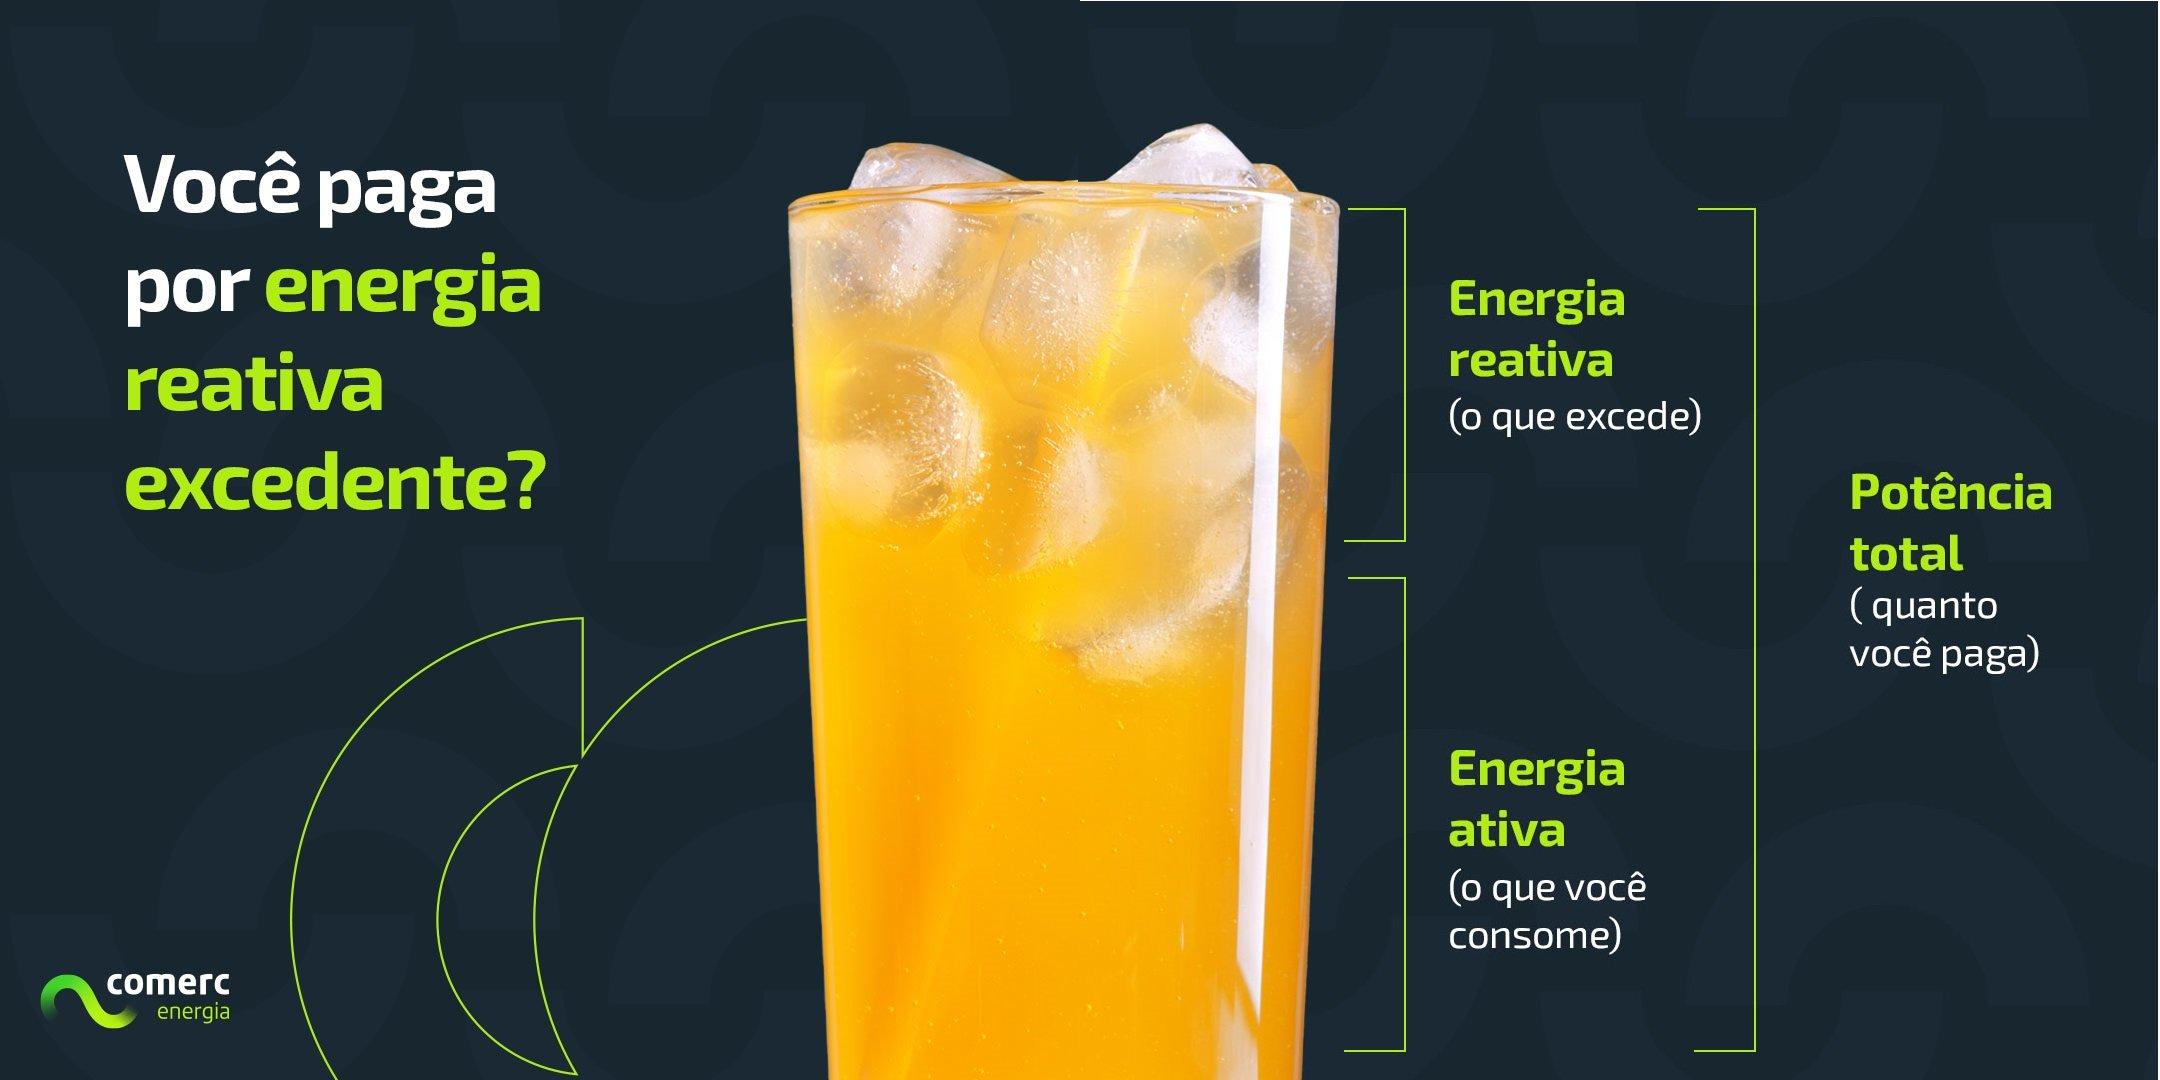 Post_Comerc_Energia-Reativa